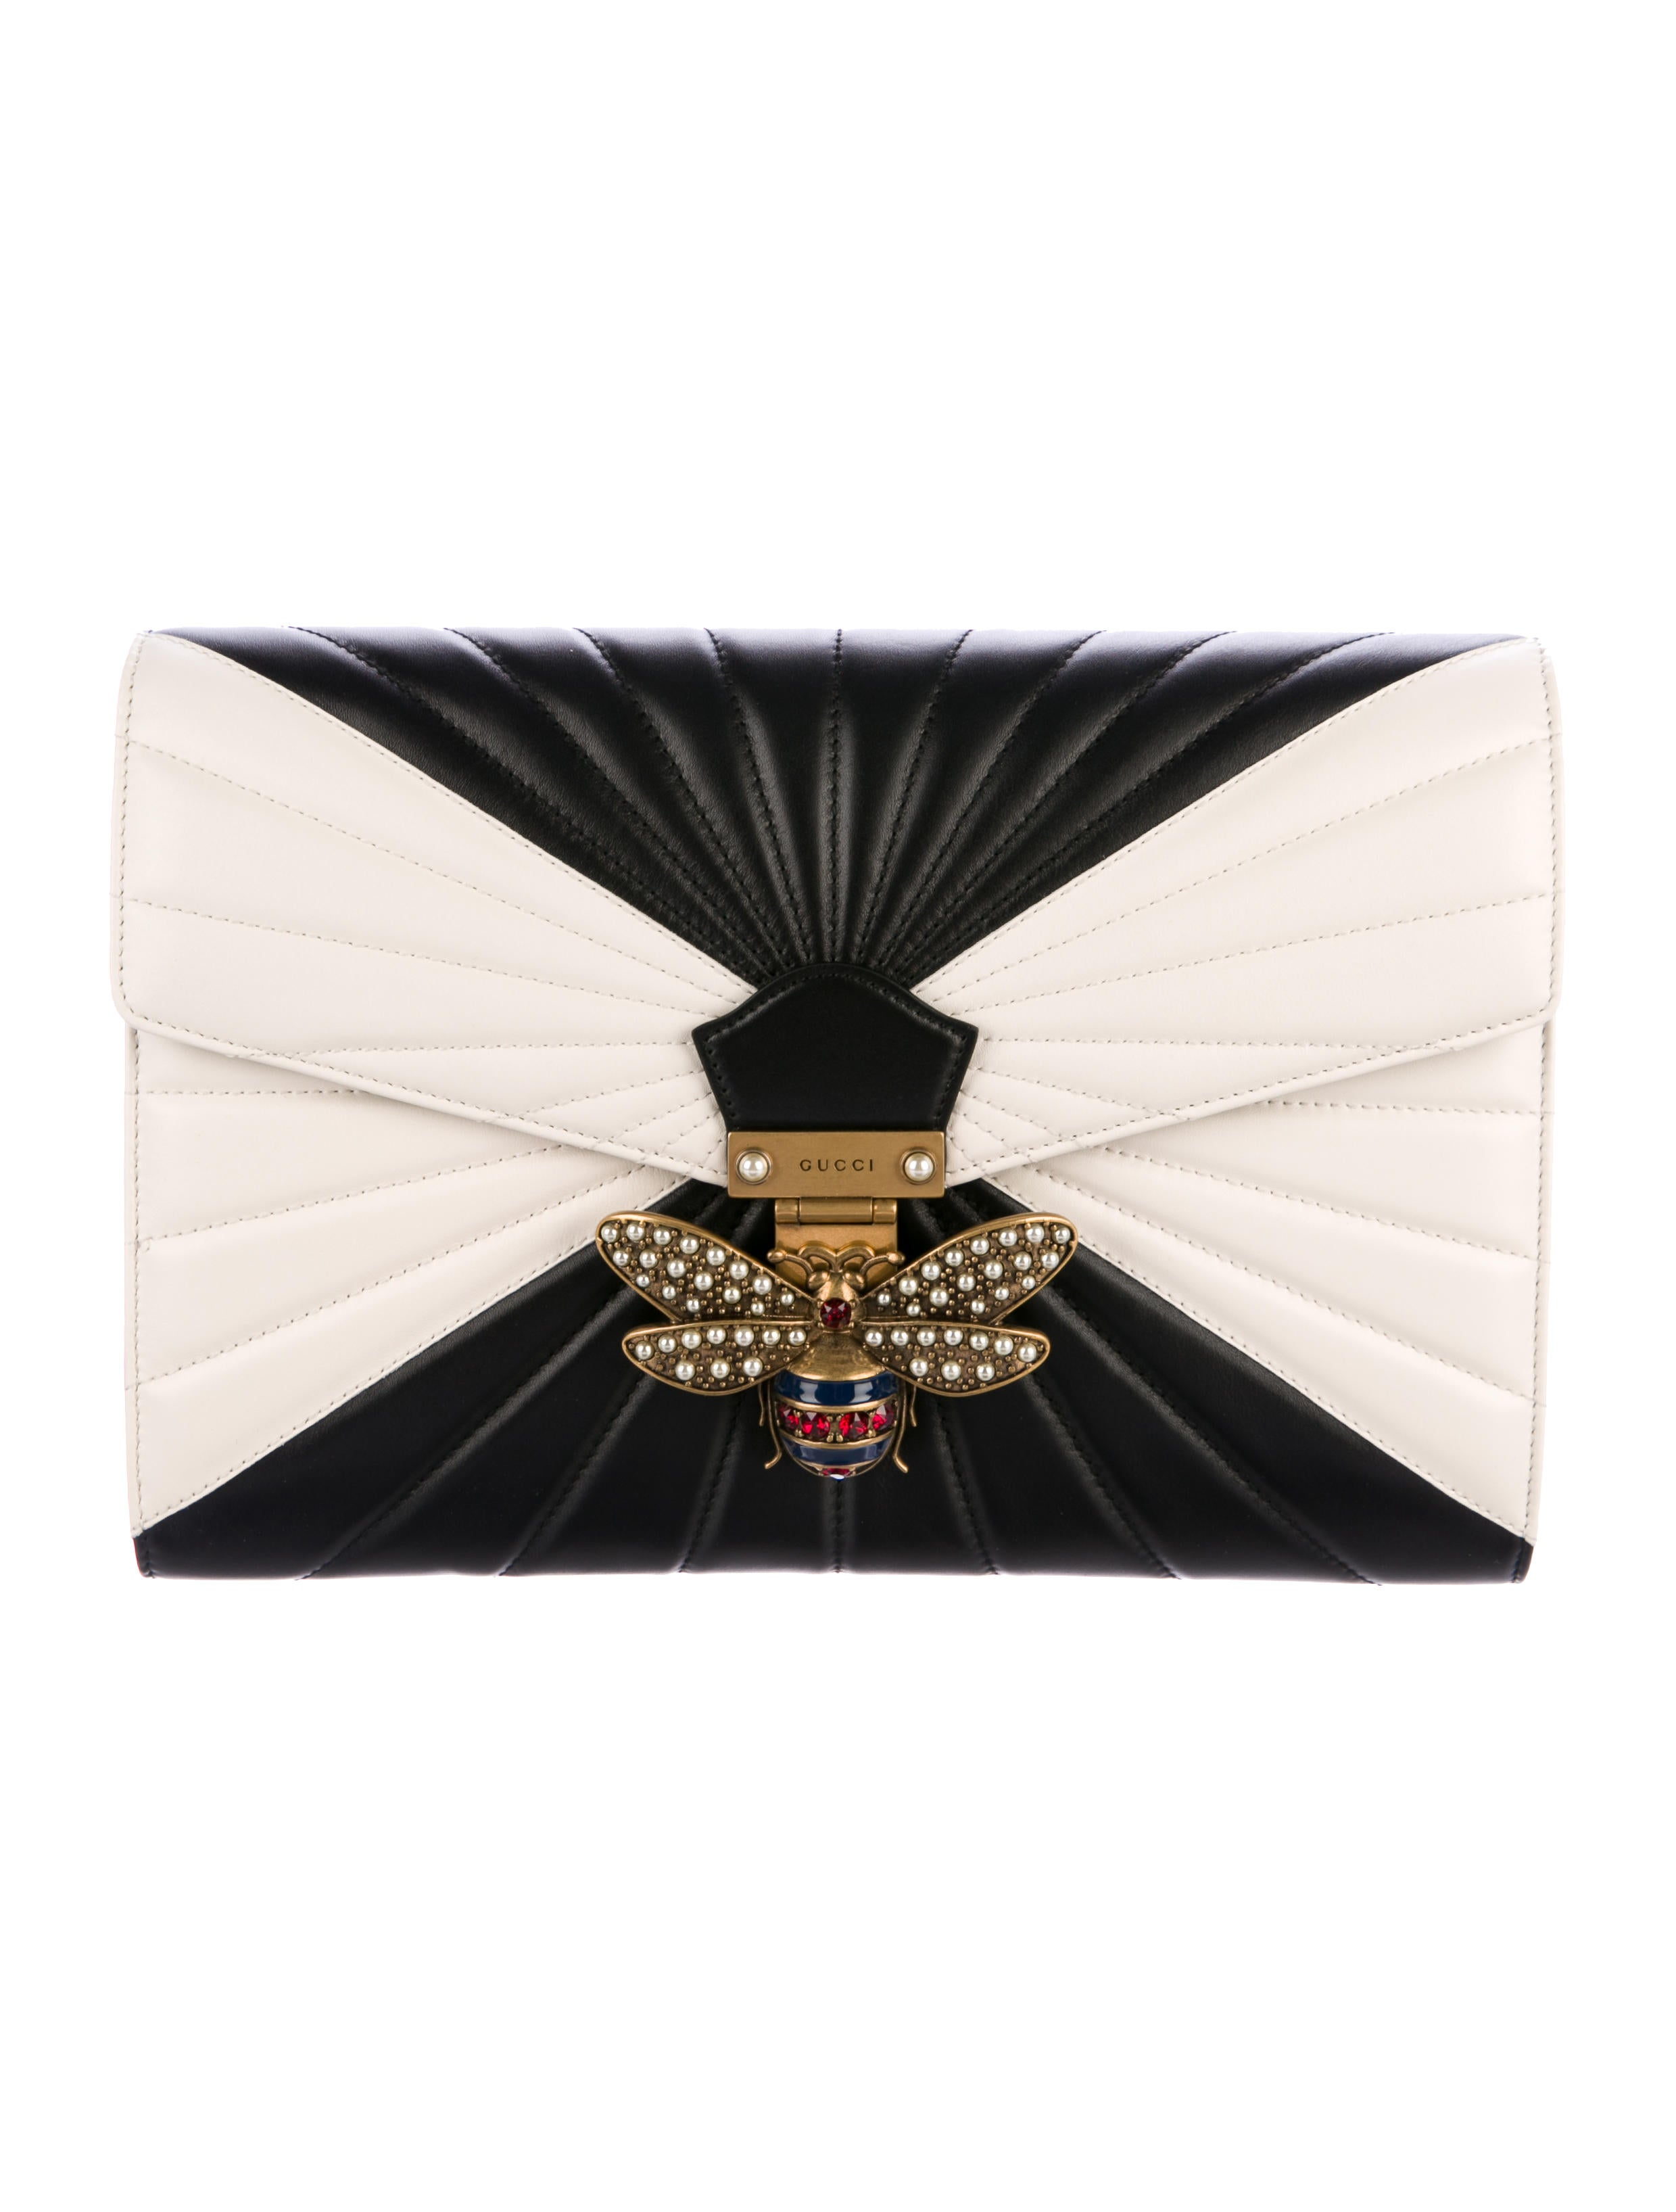 4d9d2a901e2 Gucci 2017 Queen Margaret Quilted Clutch - Handbags - GUC181508 ...